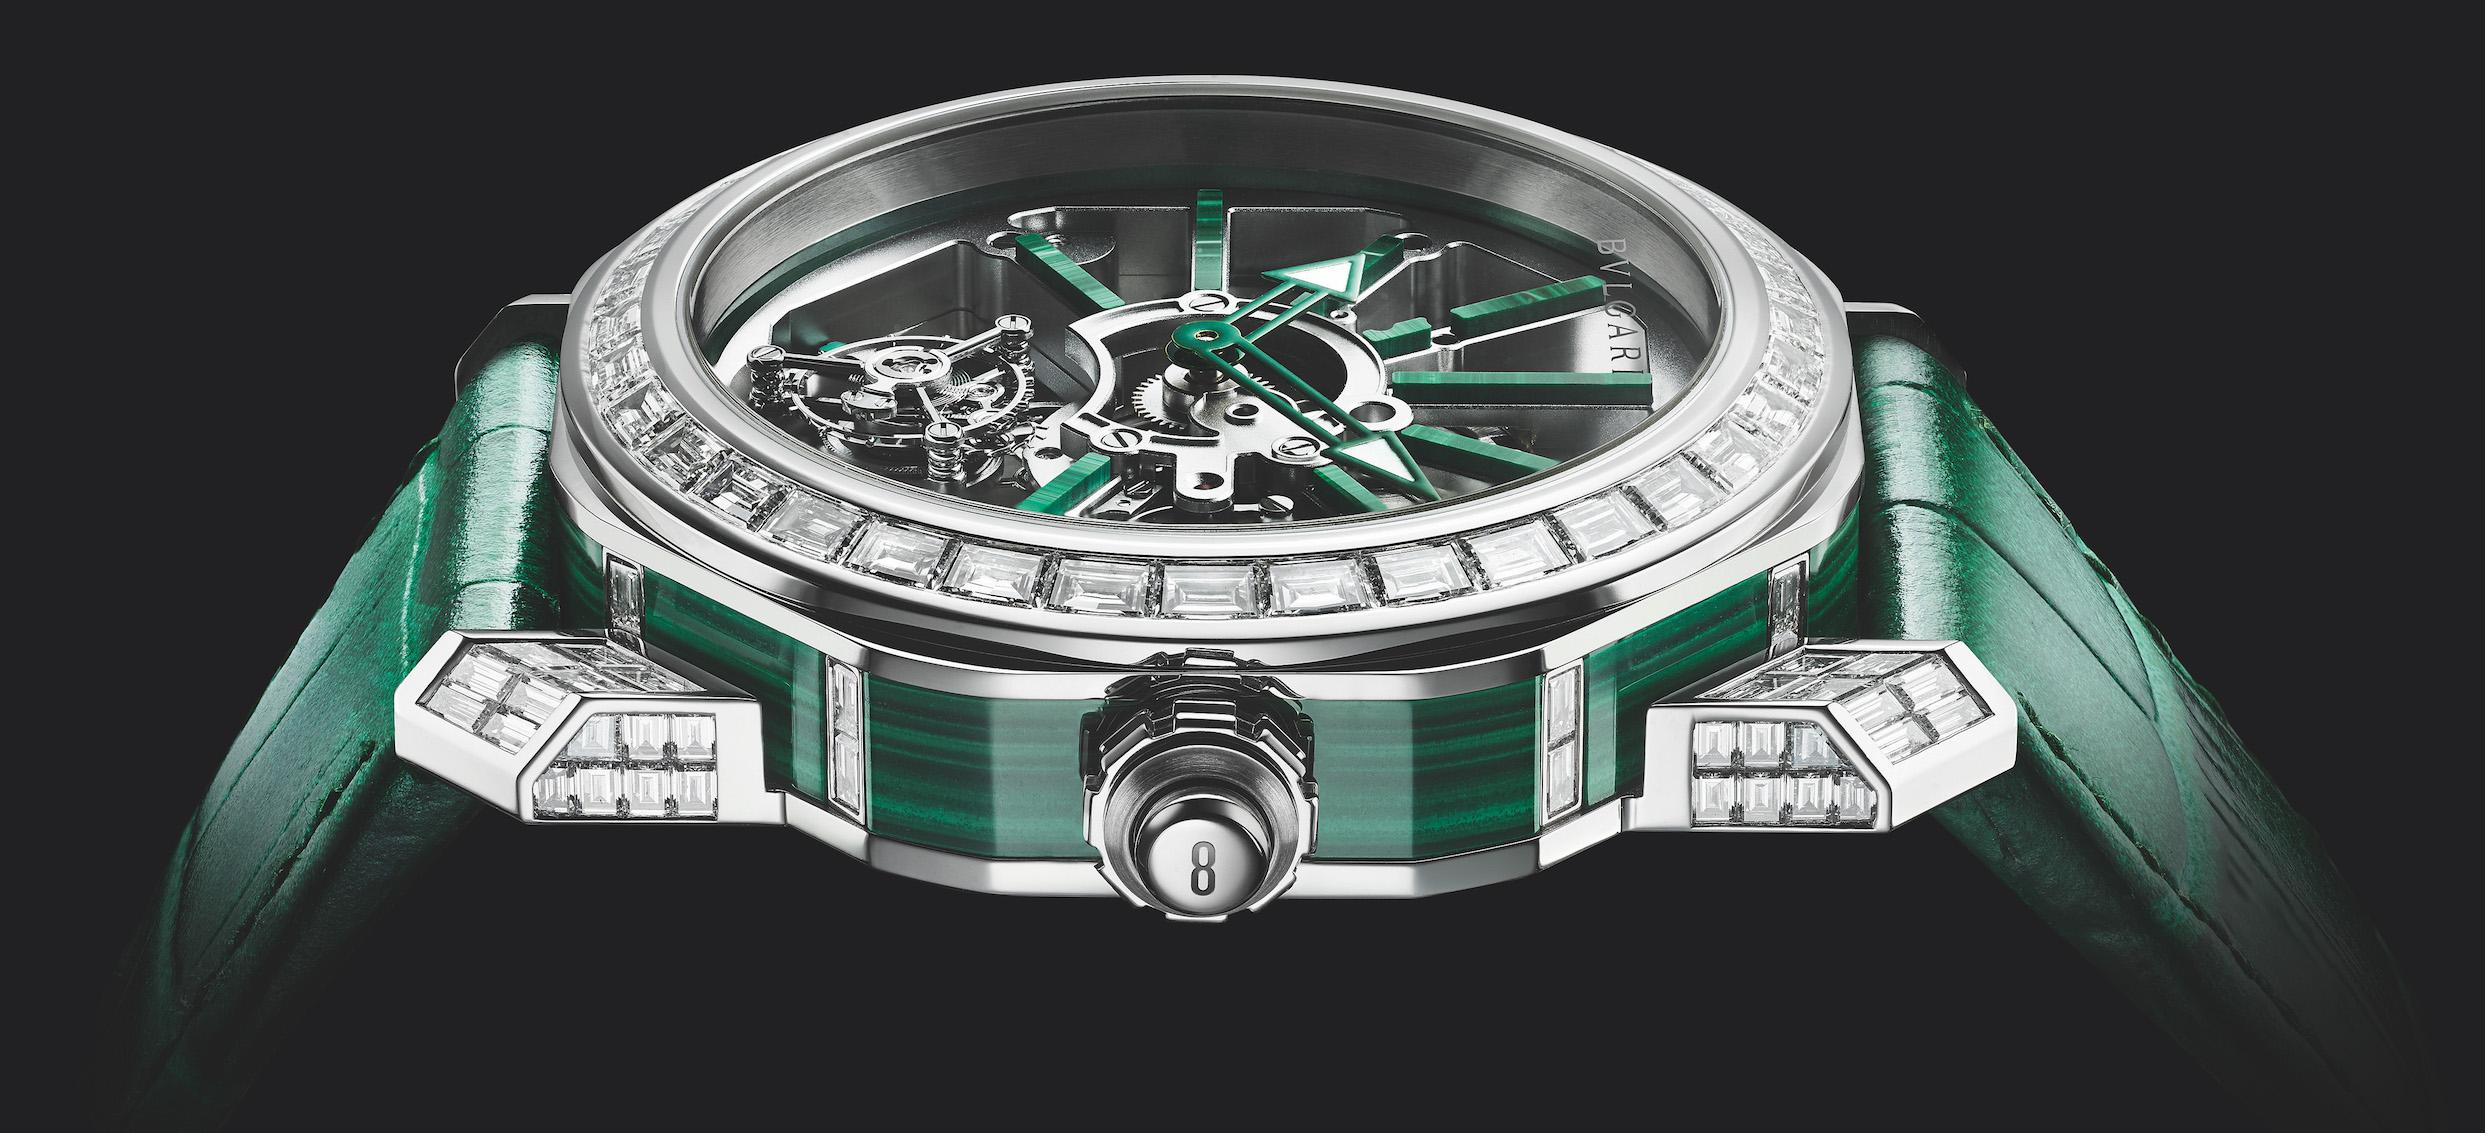 Bulgari: new Octo and Serpenti models